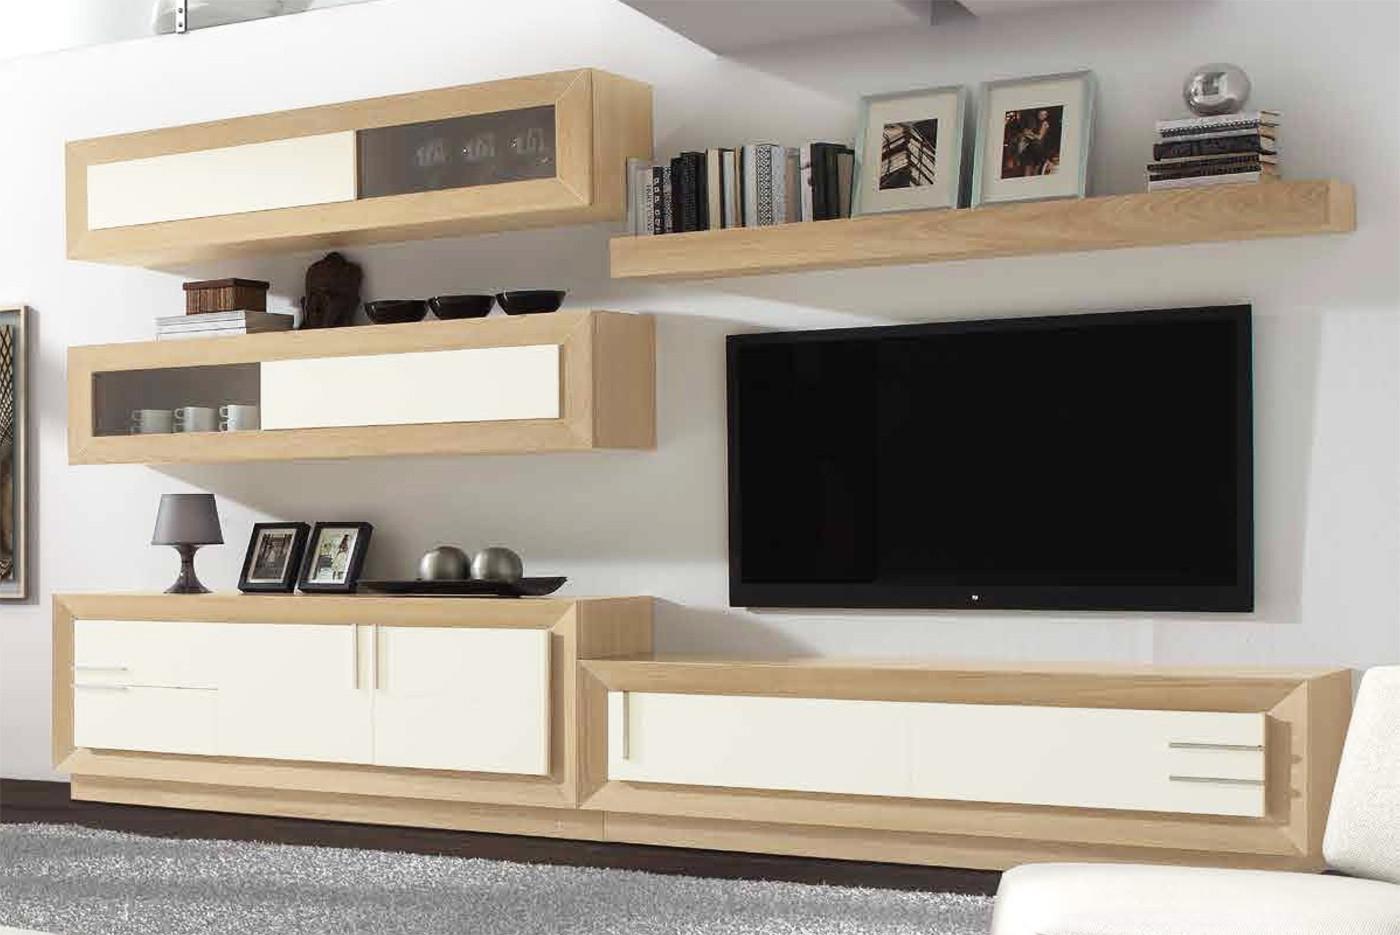 Conjunto Muebles Salon Xtd6 Muebles Modulares Para Salones Edores De Diseà O En Madera De Roble